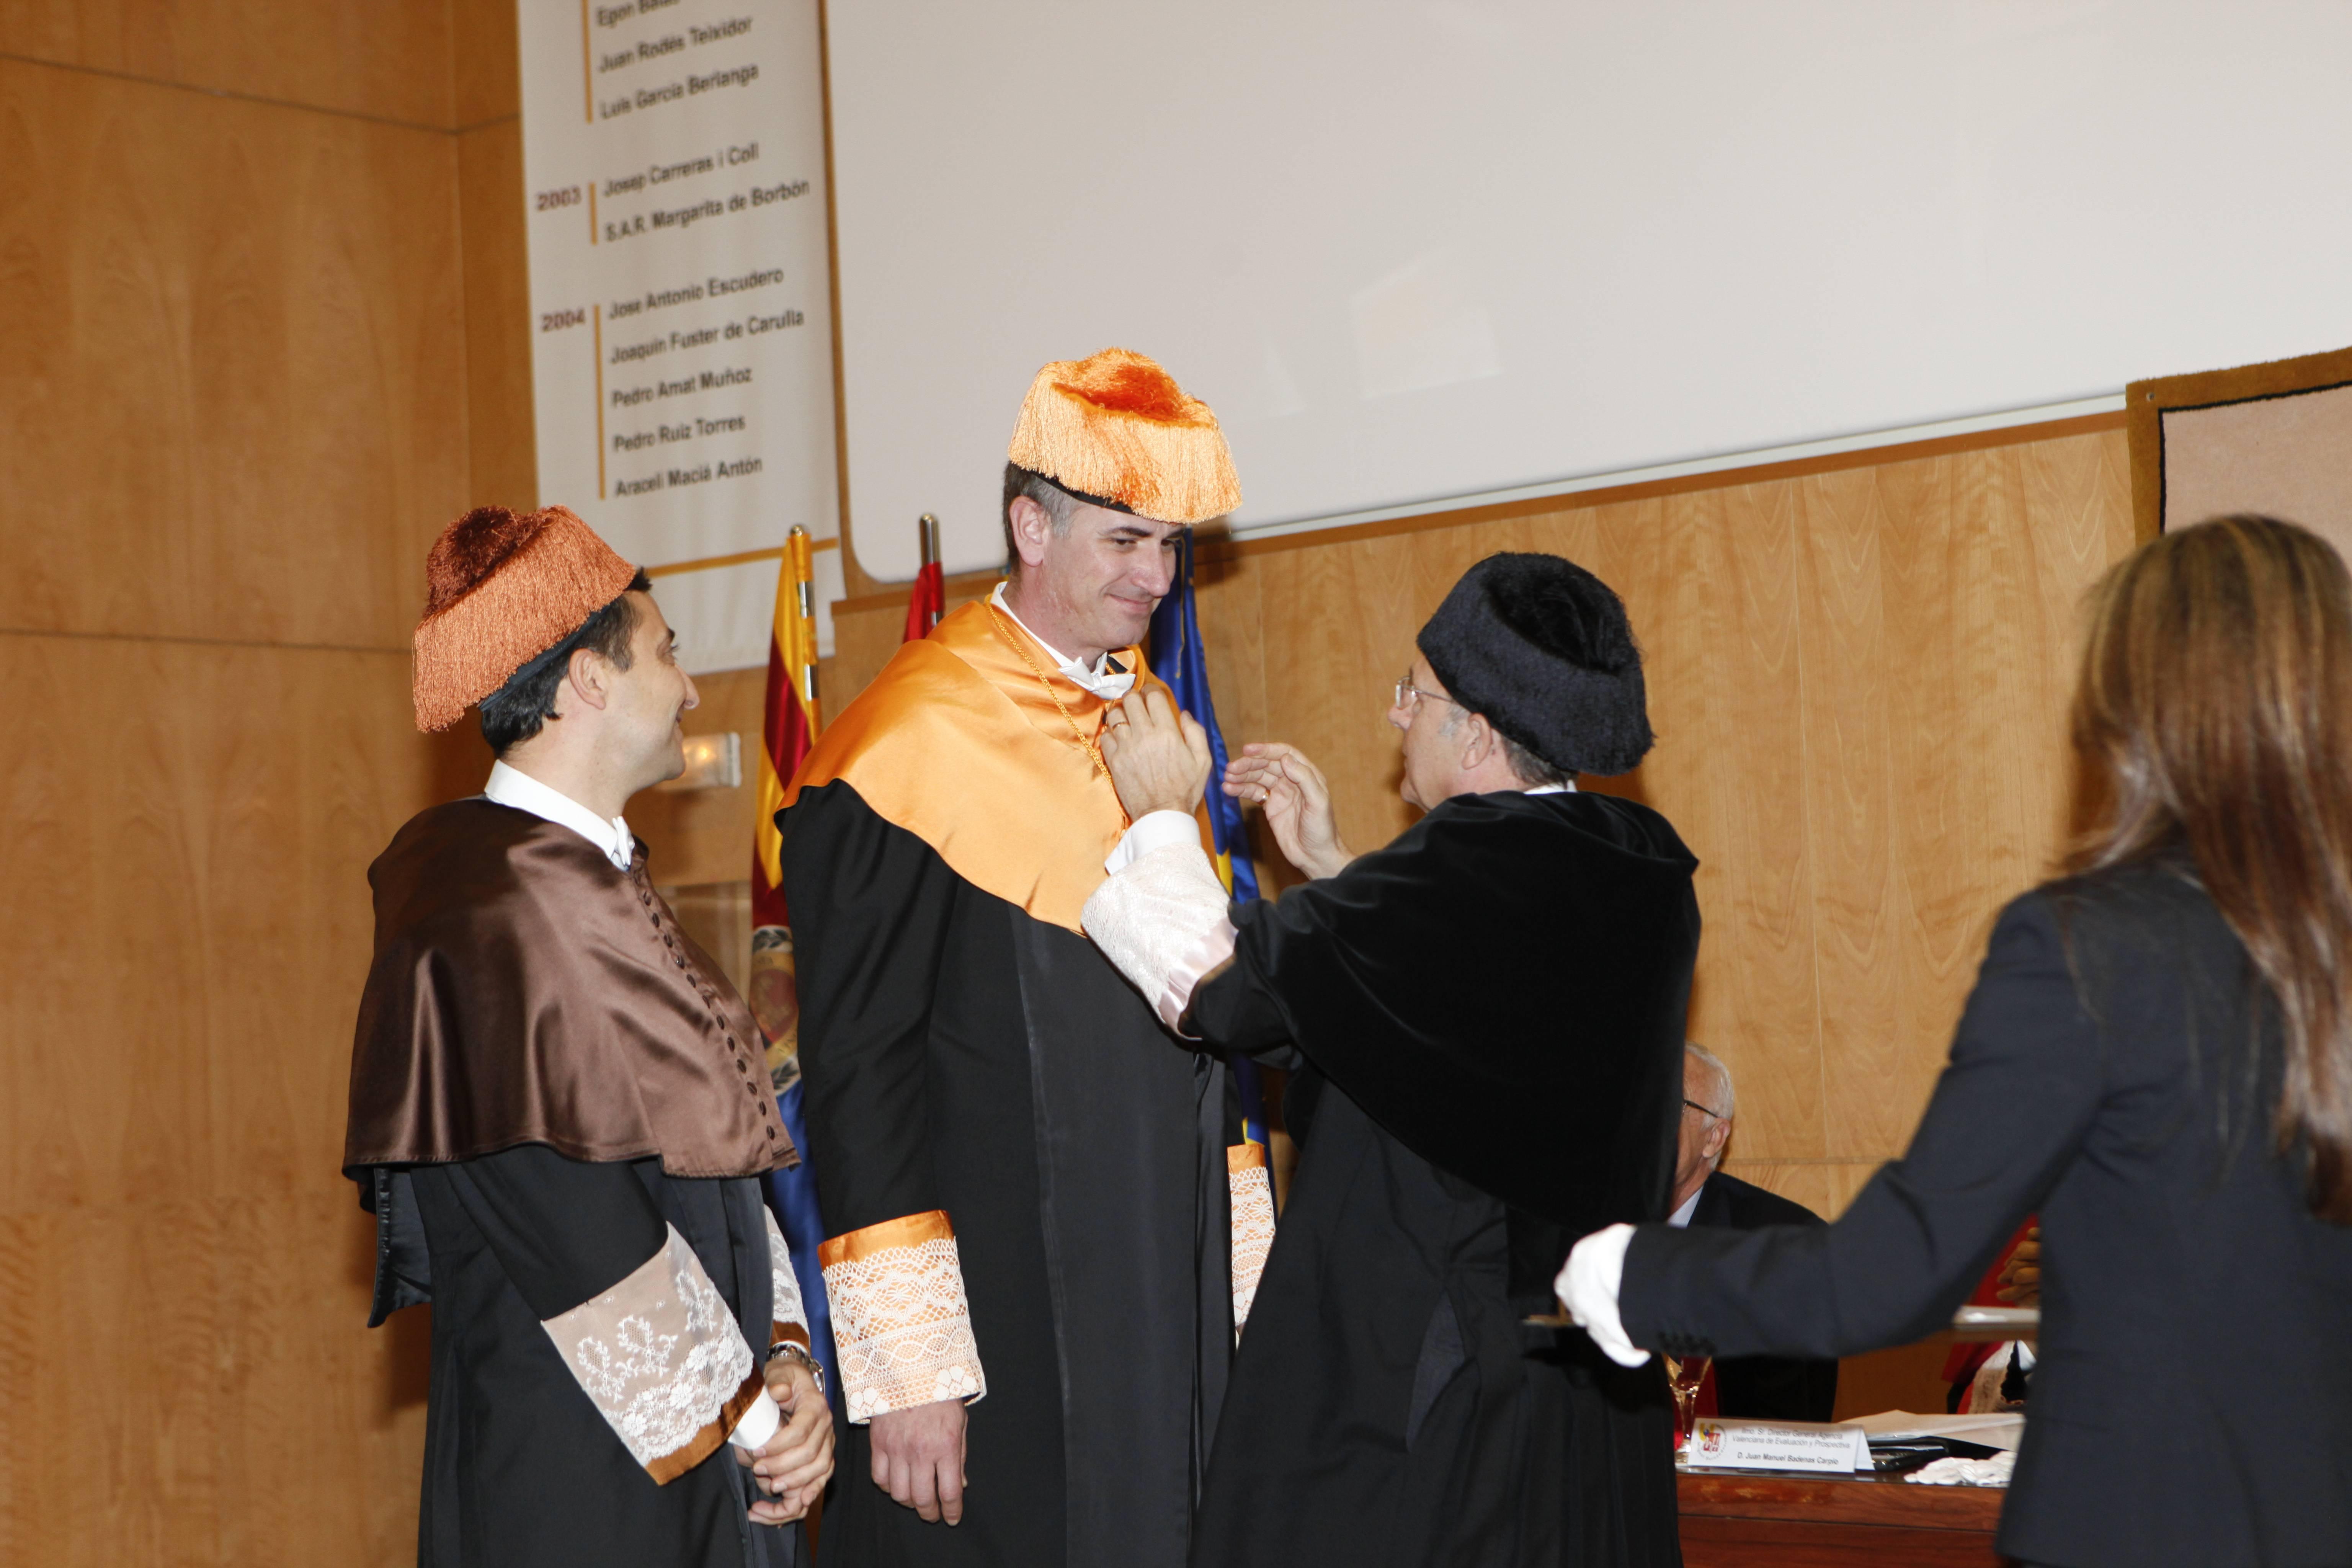 doctor-honoris-causa-luis-gamir_mg_1173.jpg